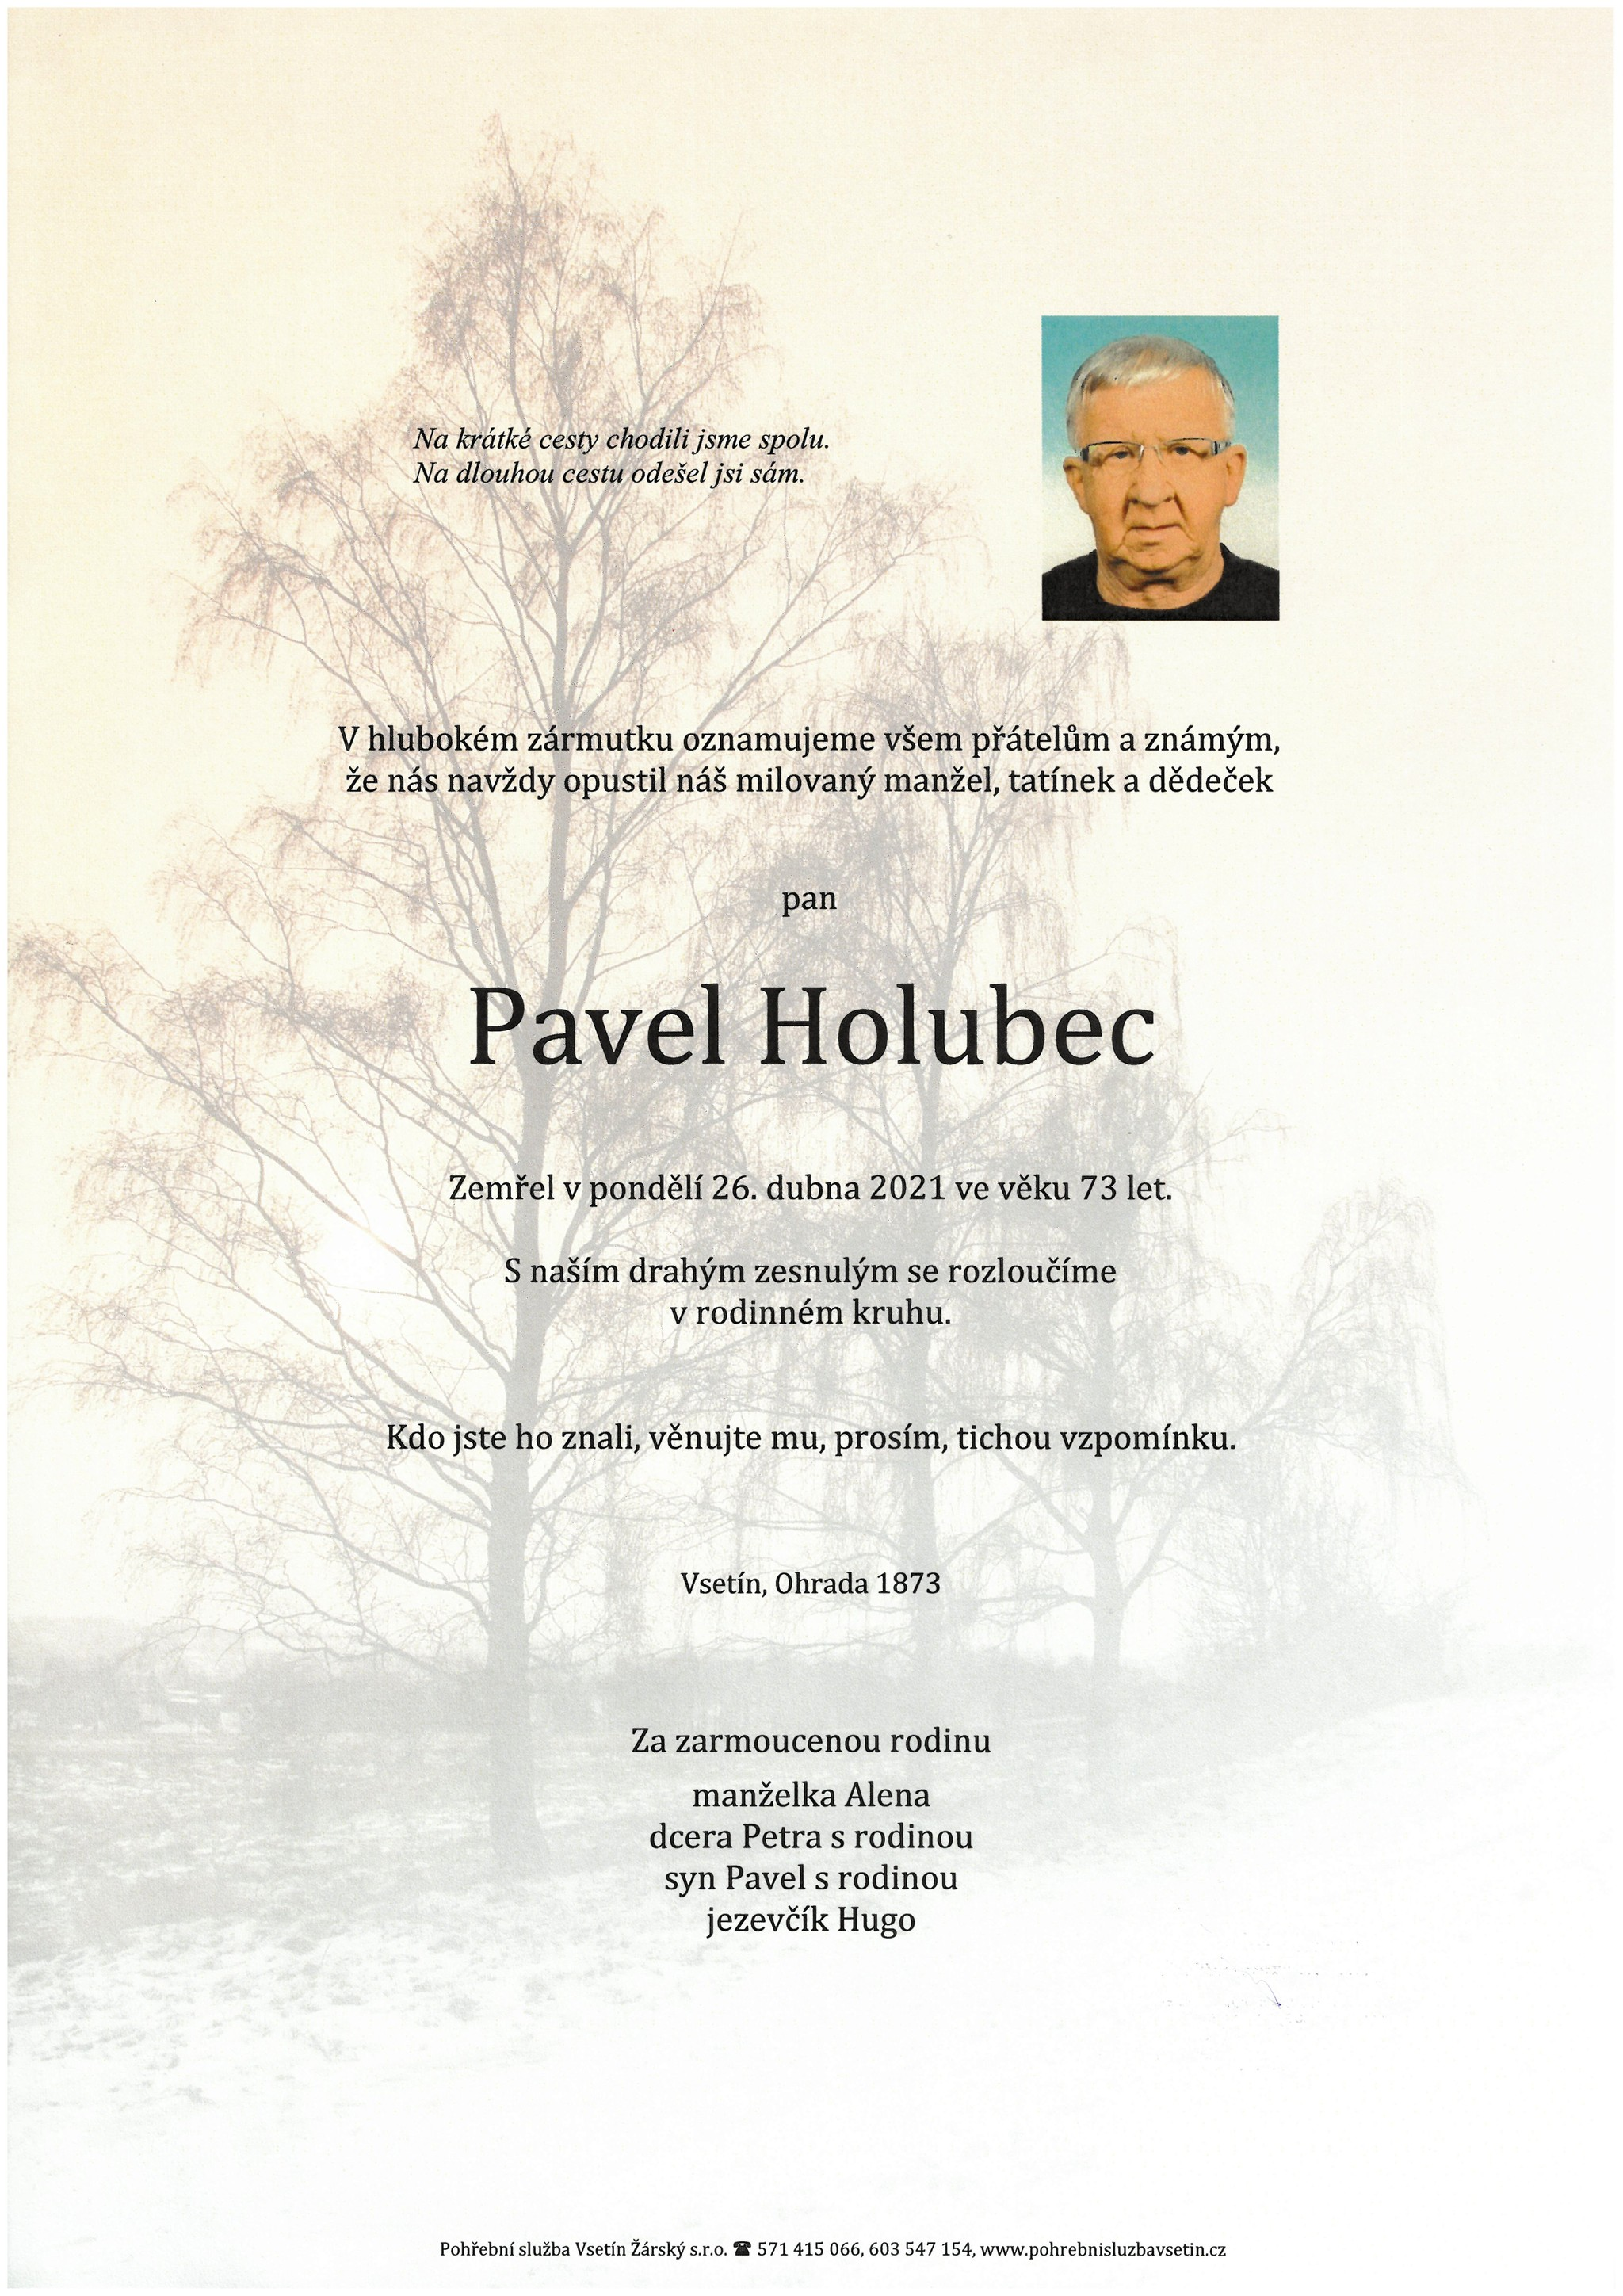 Pavel Holubec